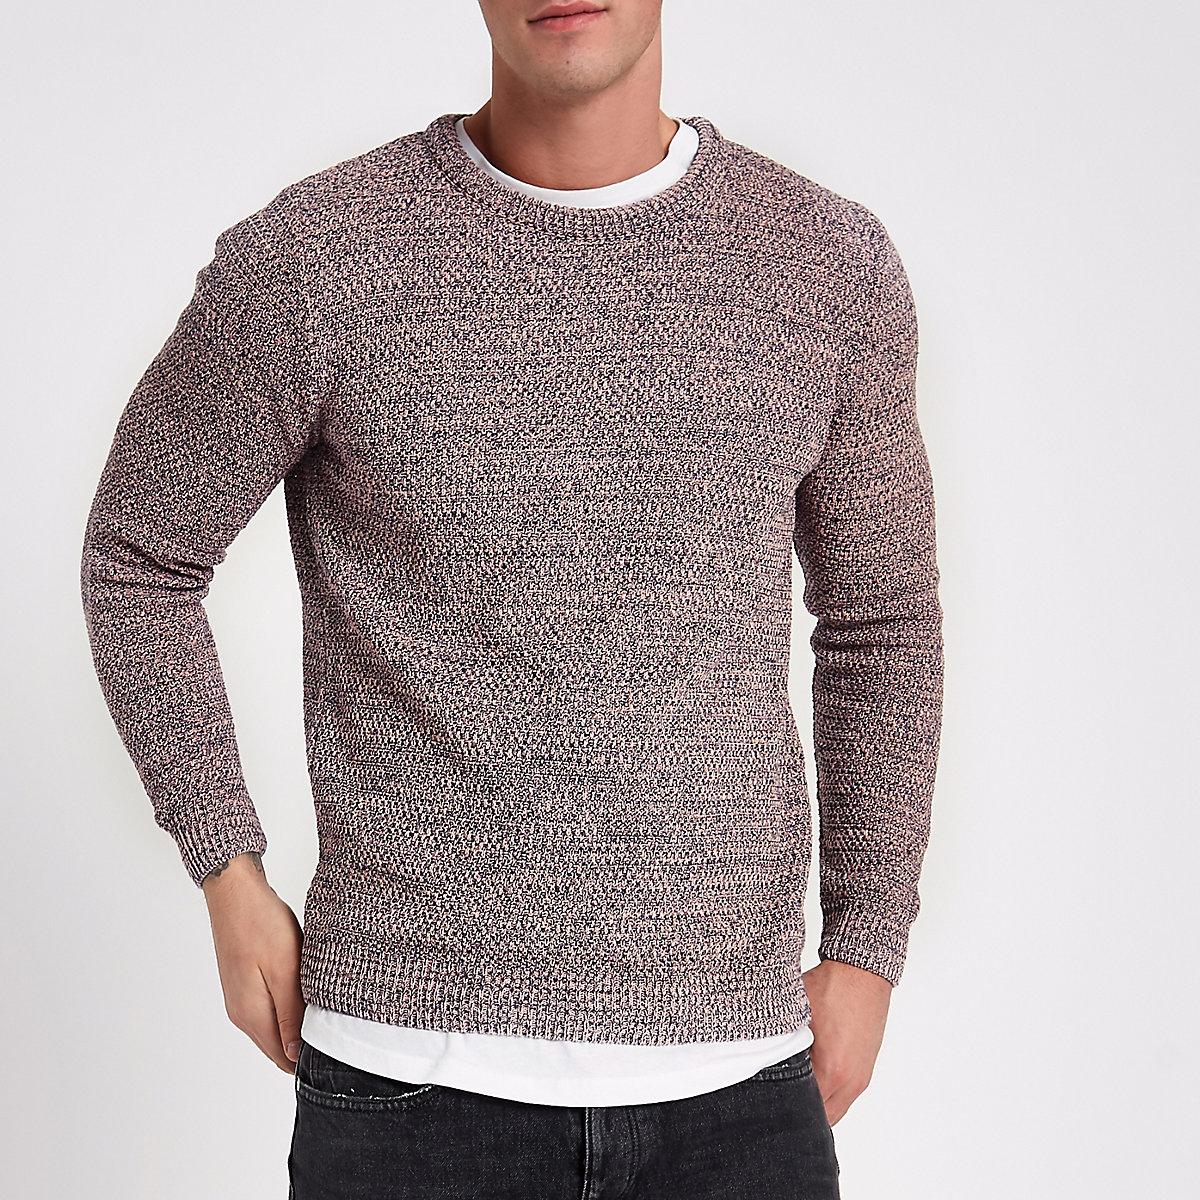 Pink textured knit slim fit crew neck sweater